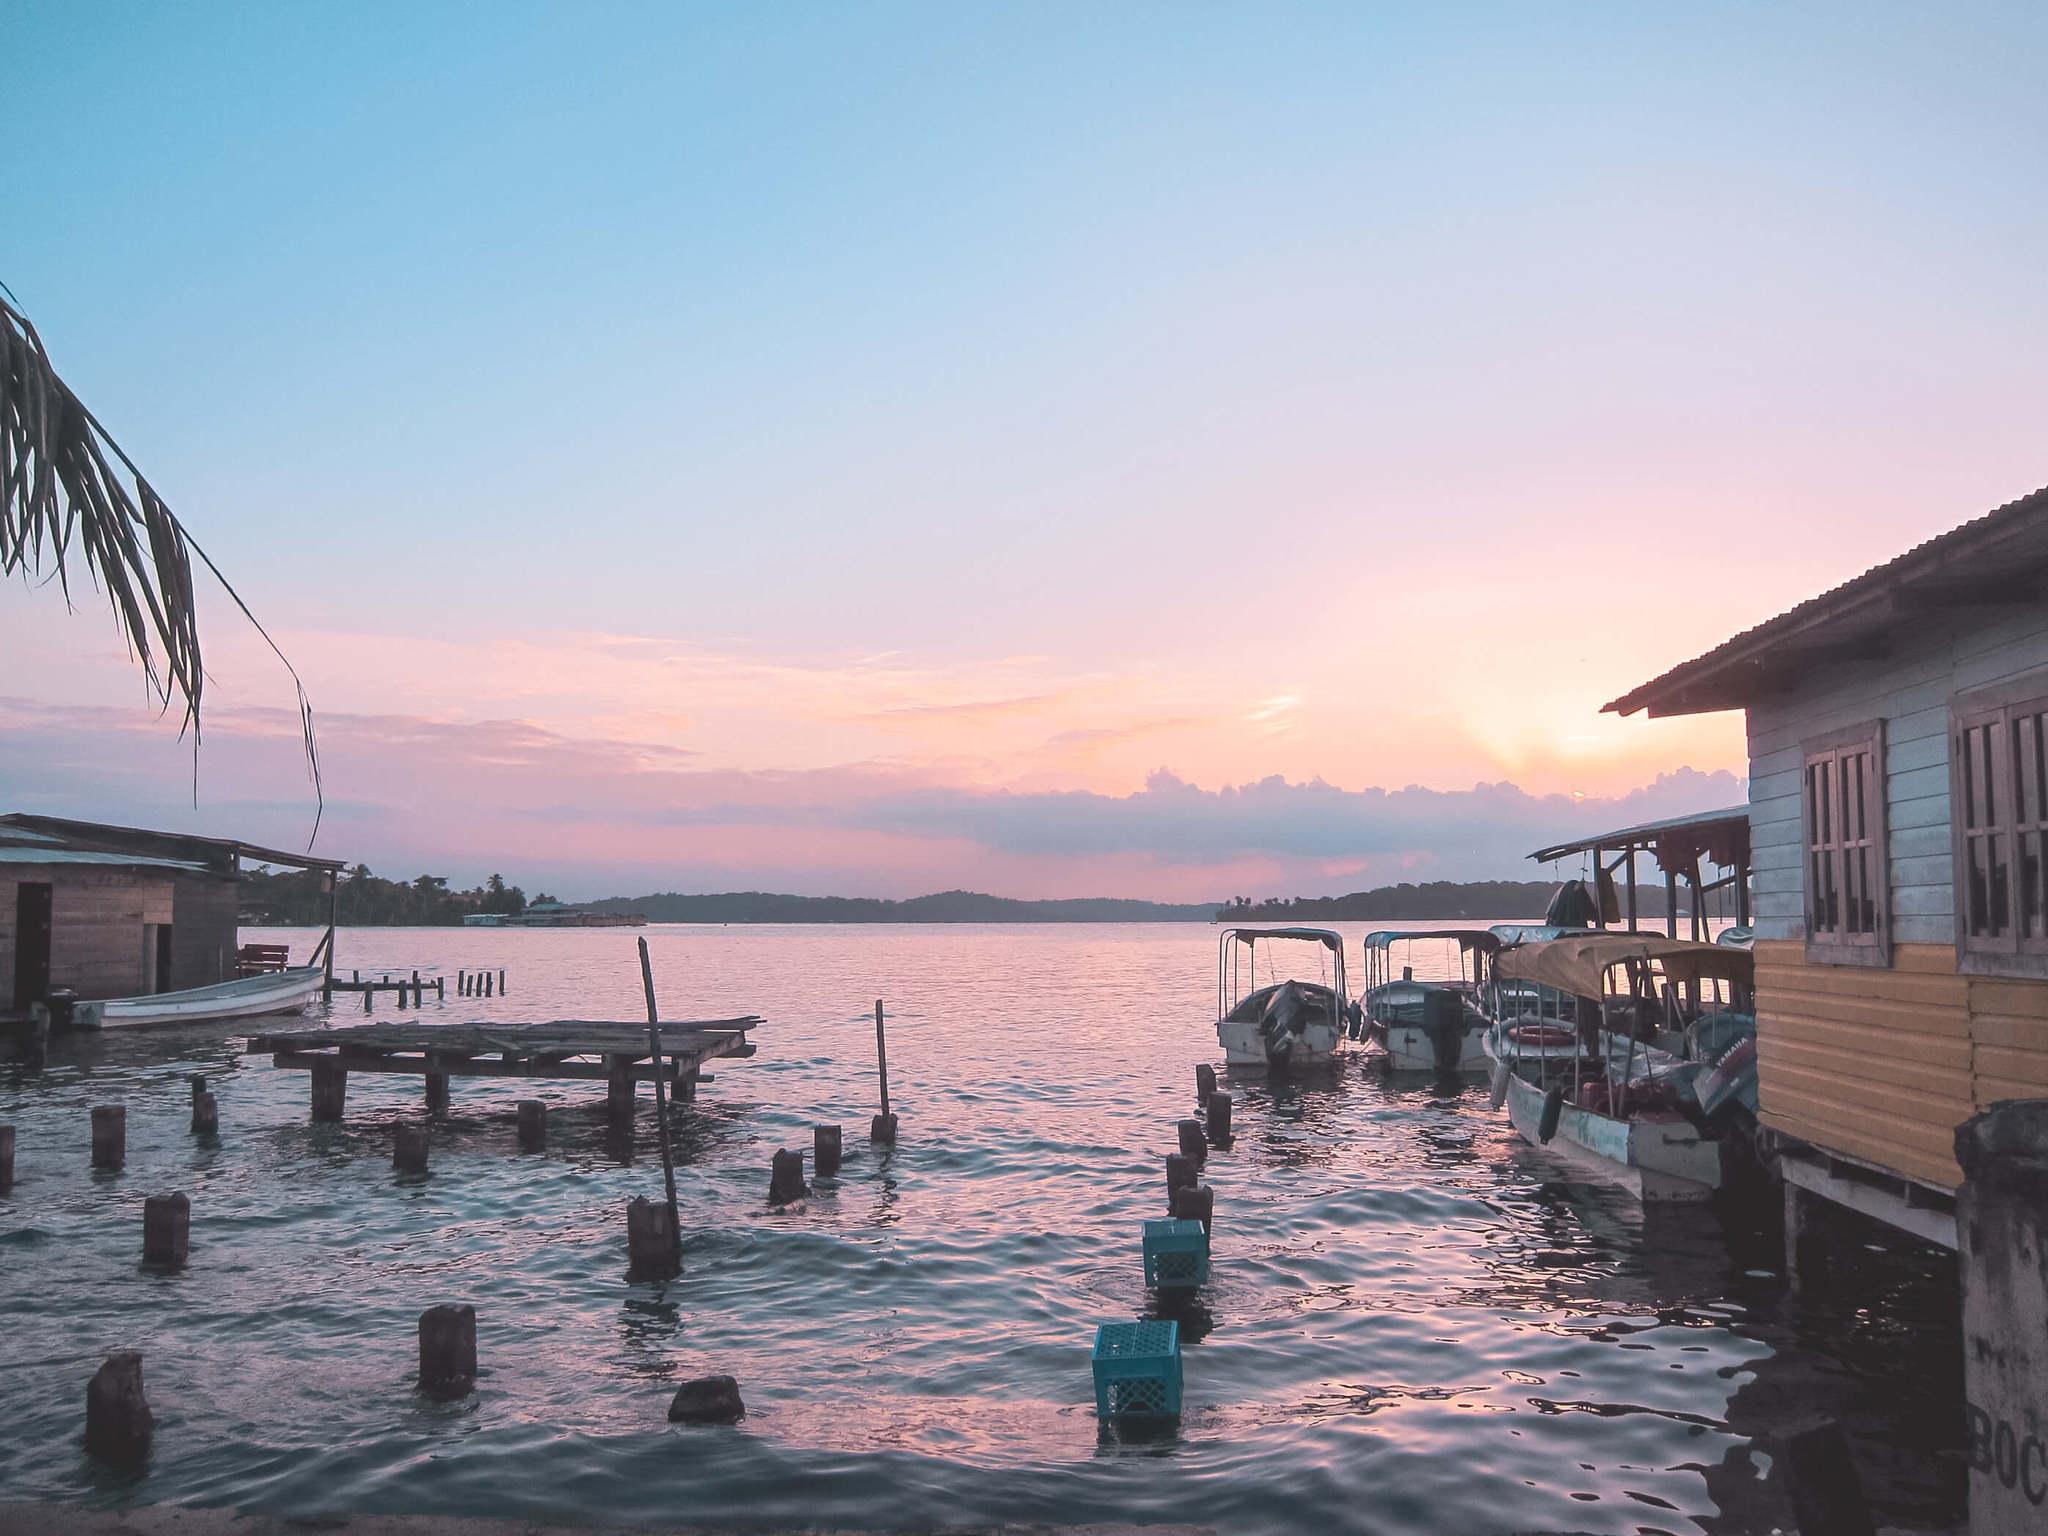 Sunset in Panama